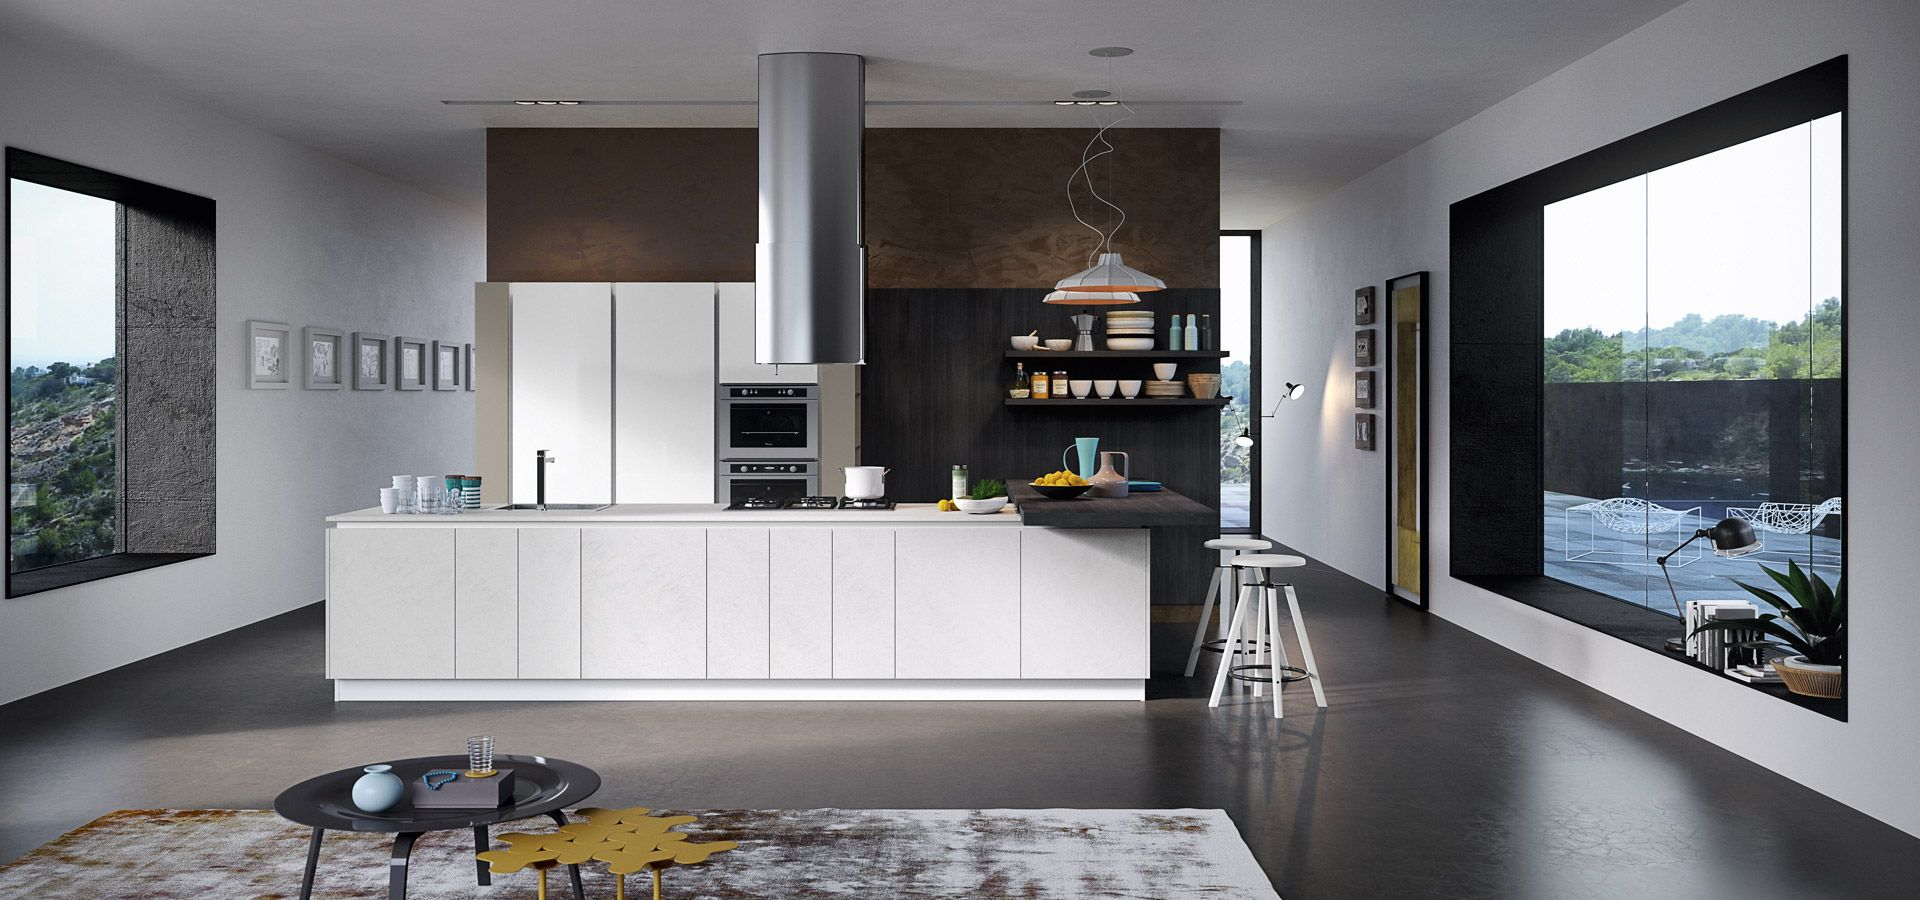 Contemporary Kitchens Traditional Modern Classic Kalì Arredo3